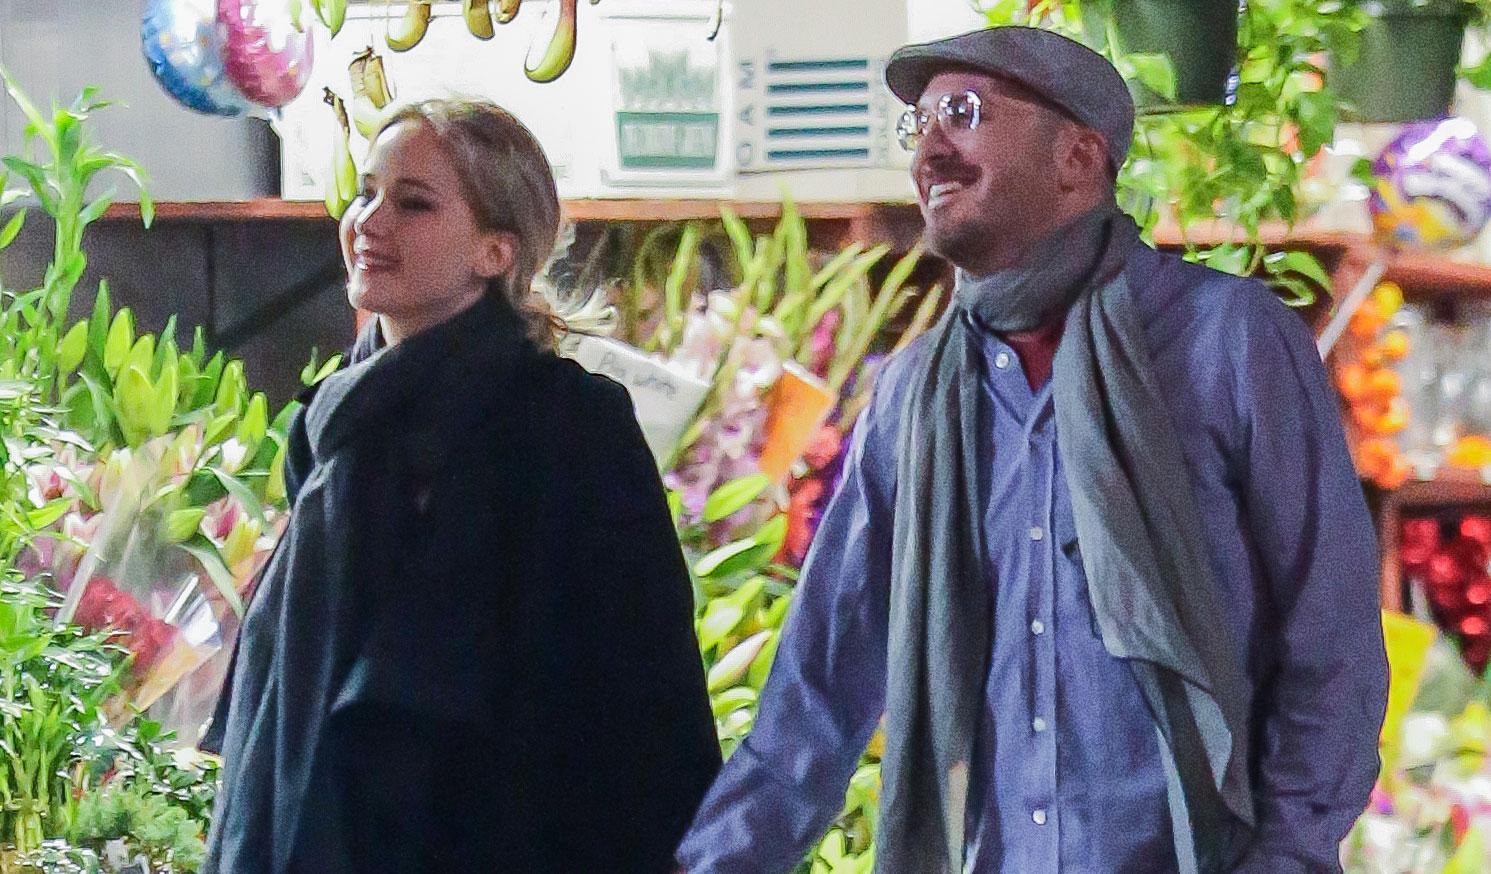 Jennifer Lawrence Flaunts Lots of PDA with New Boyfriend ...